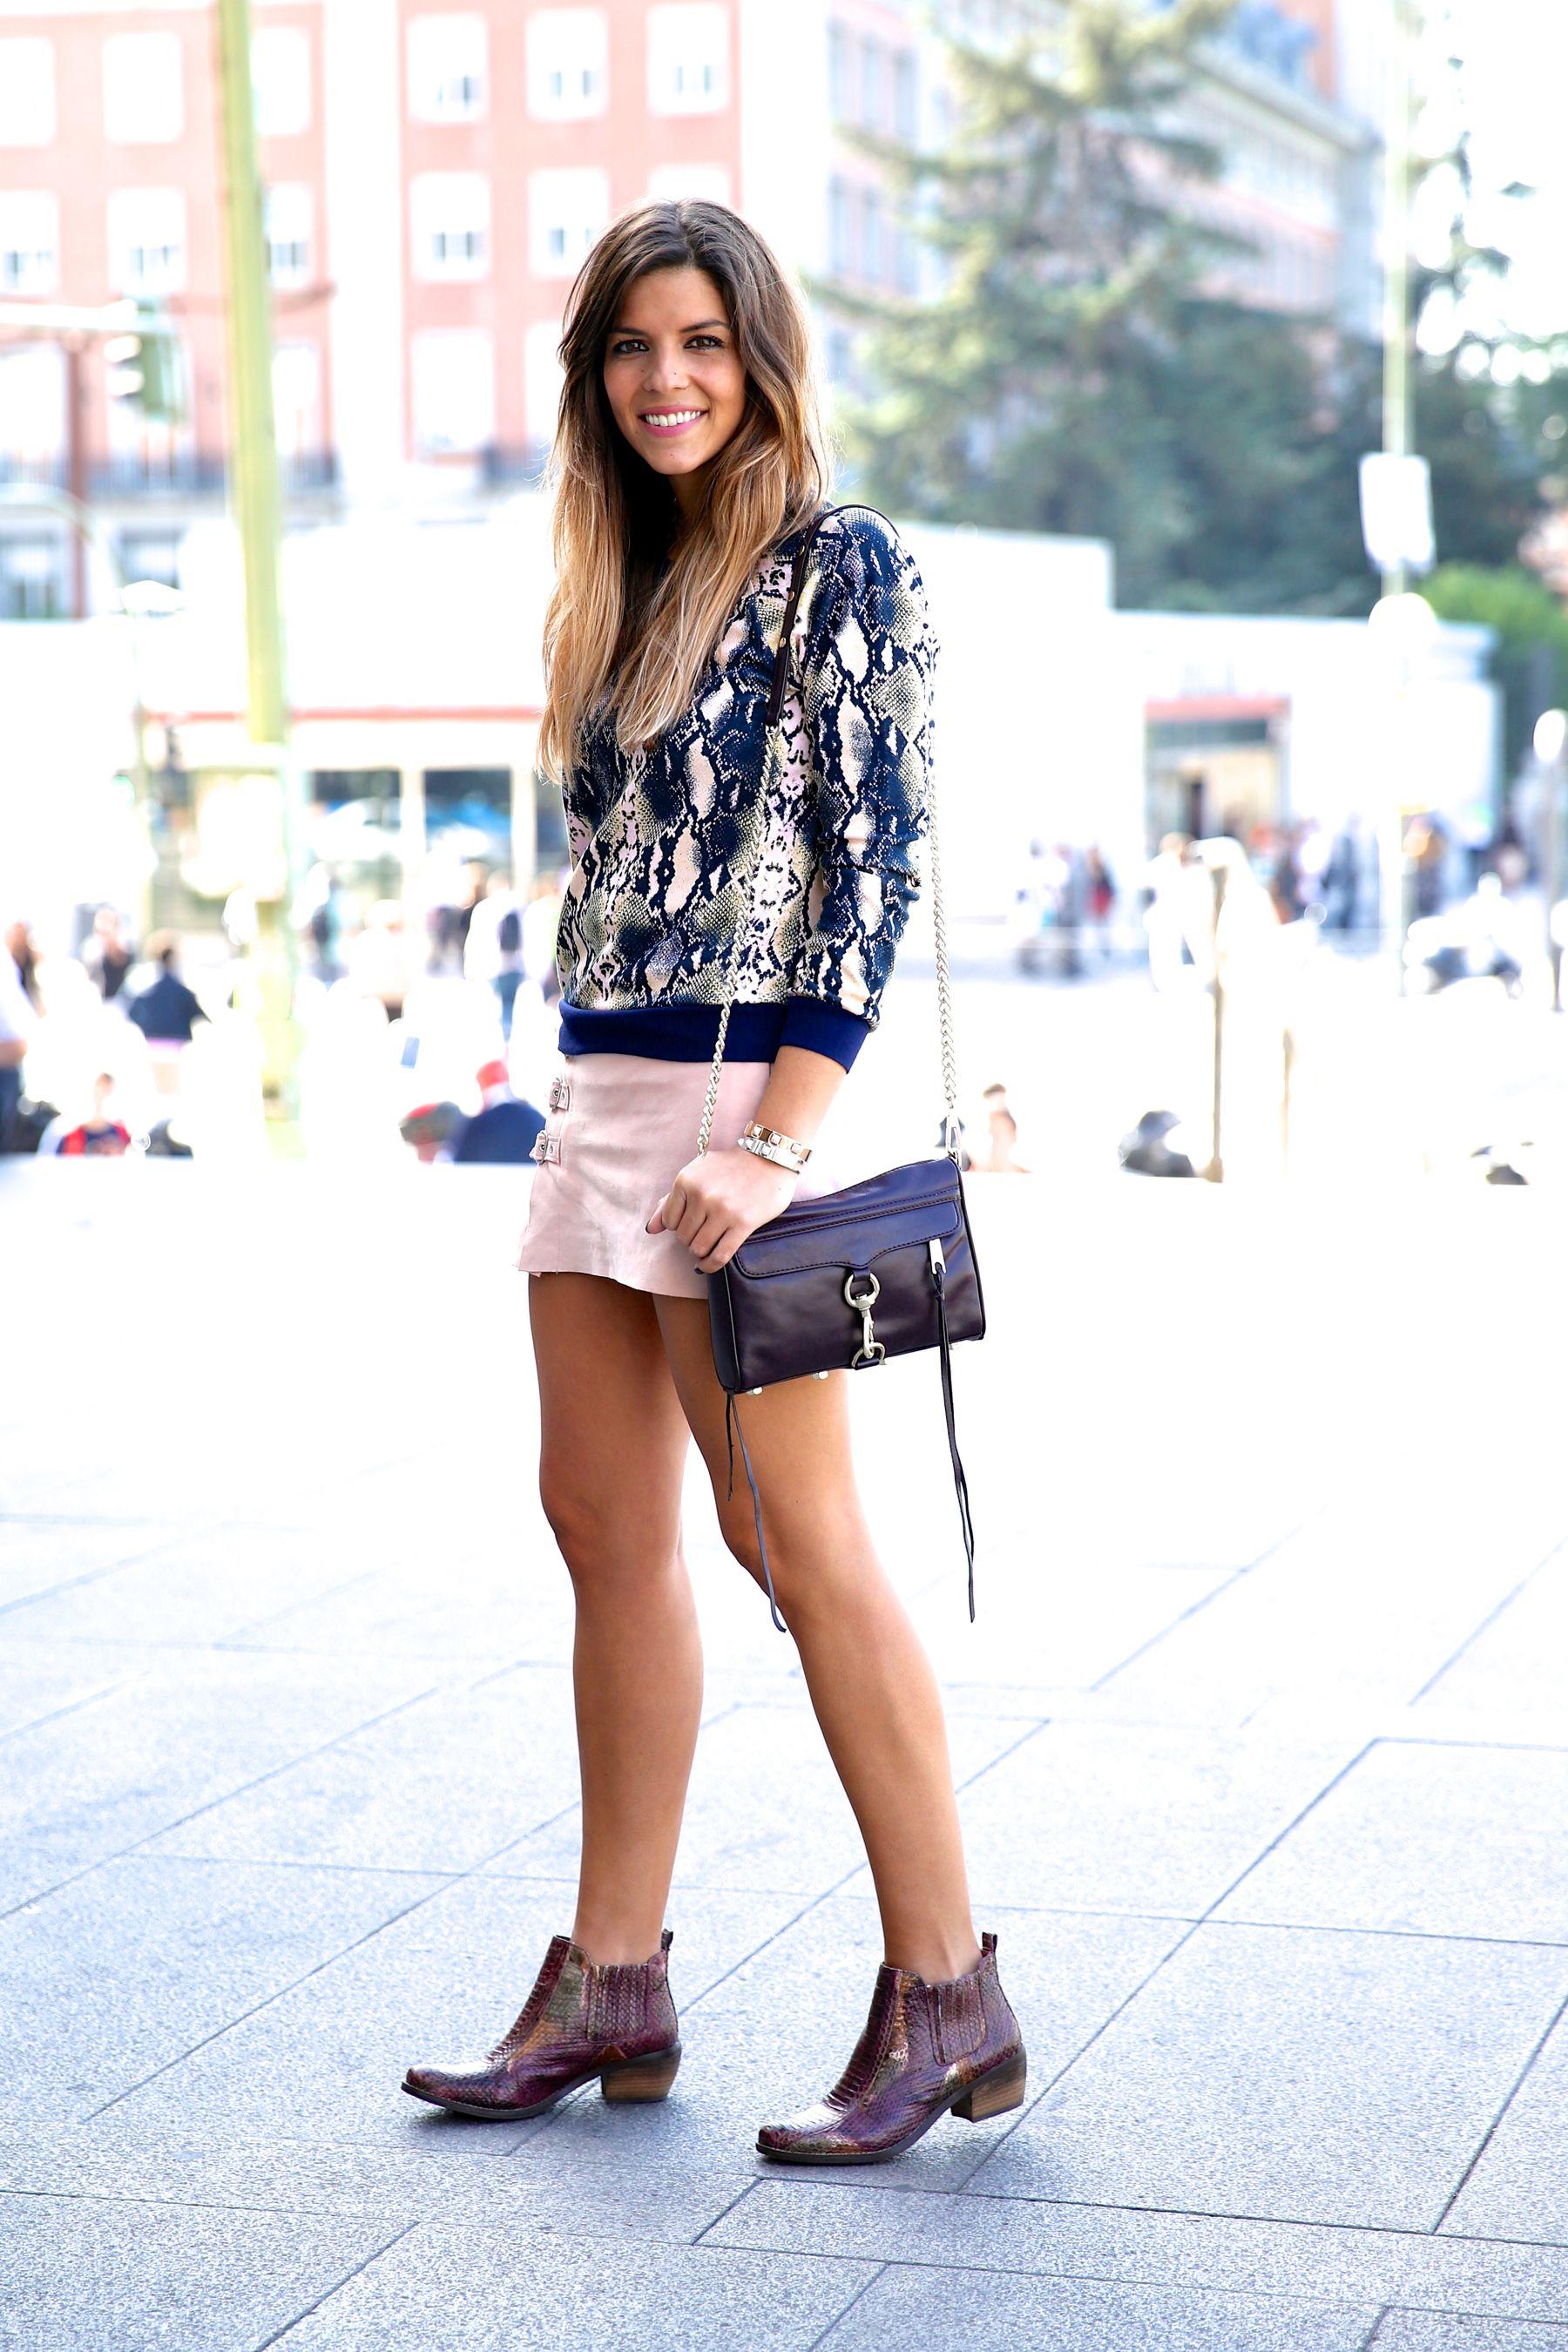 trendy_taste-look-outfit-street_style-ootd-blog-blogger-fashion_spain-moda_españa-girissima.com-sweatshirt-sudadera-estampado-crocodile-cocodrilo-botines-booties-pink_skirt-falda_rosa-10